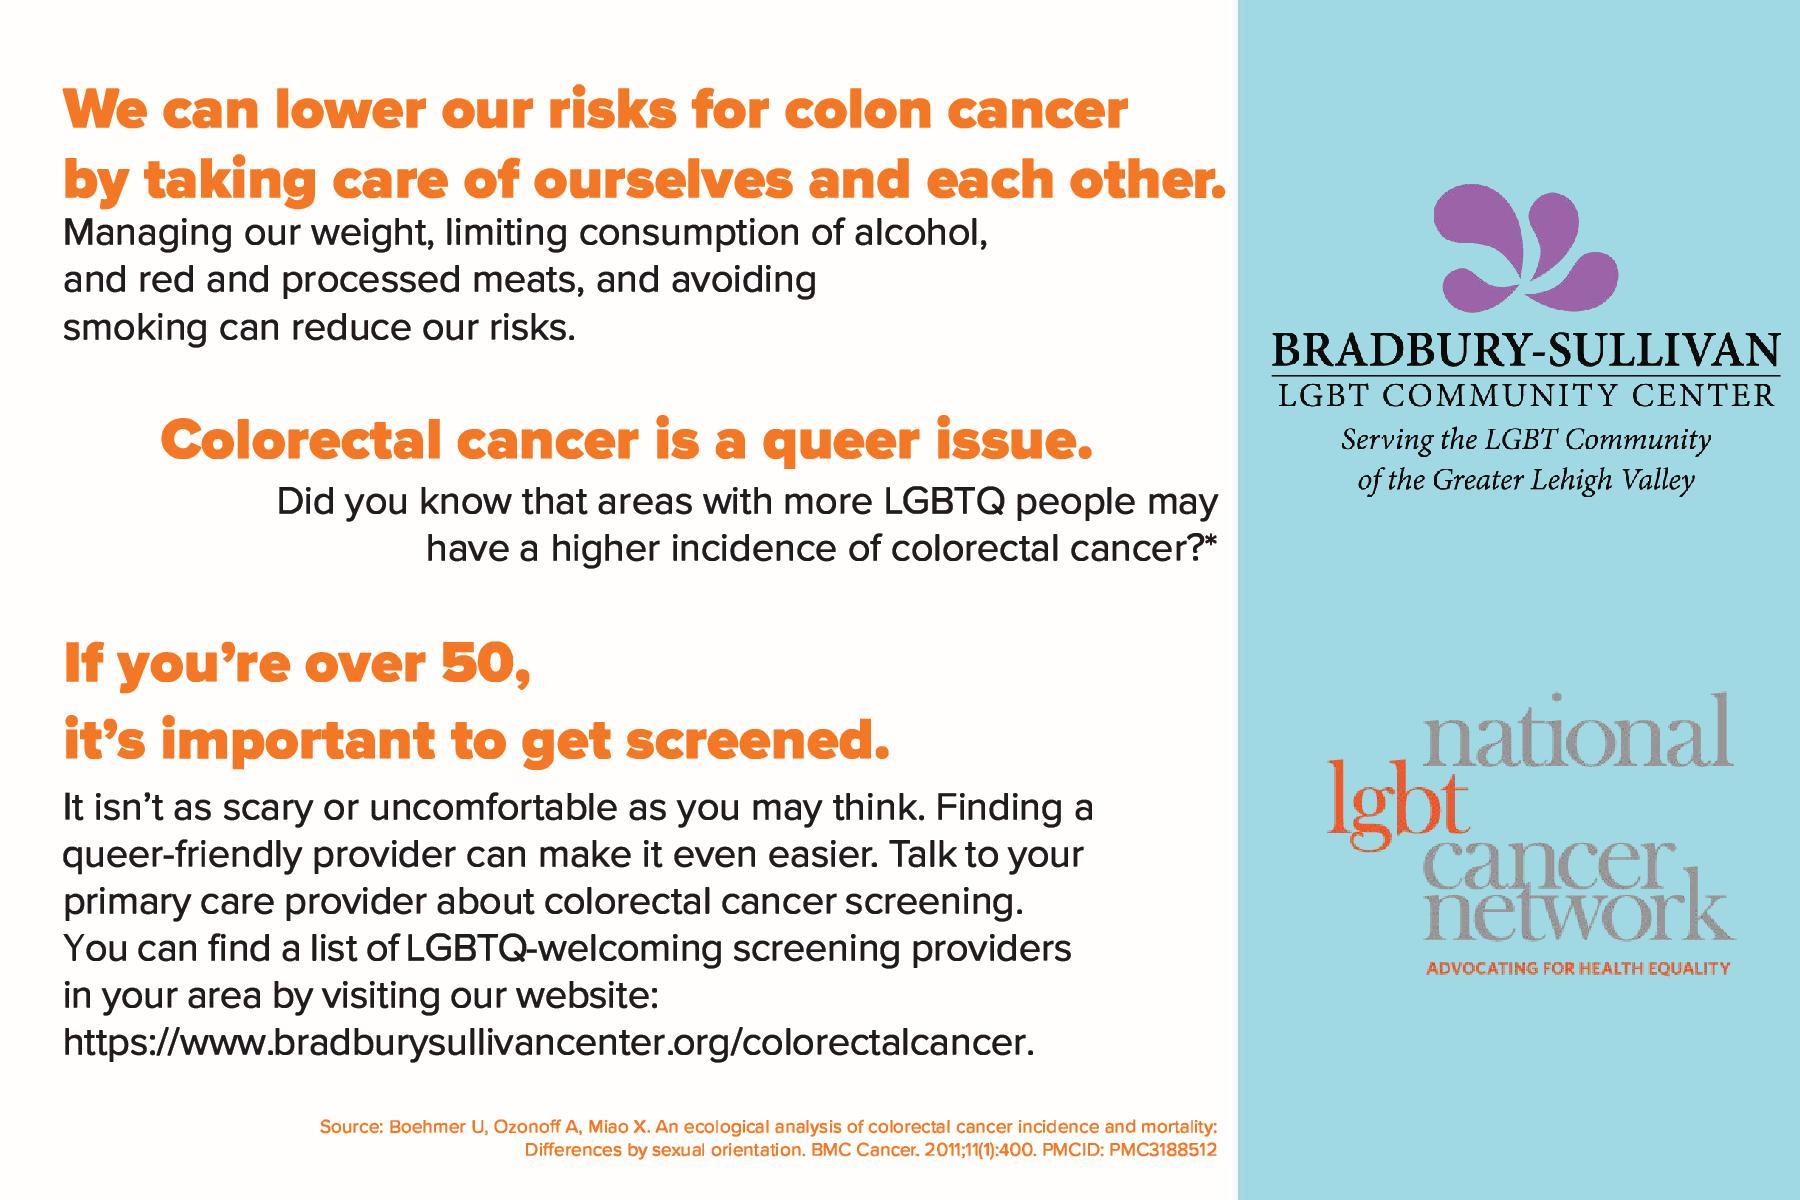 Colorectal Cancer Bradbury Sullivan Lgbt Community Center